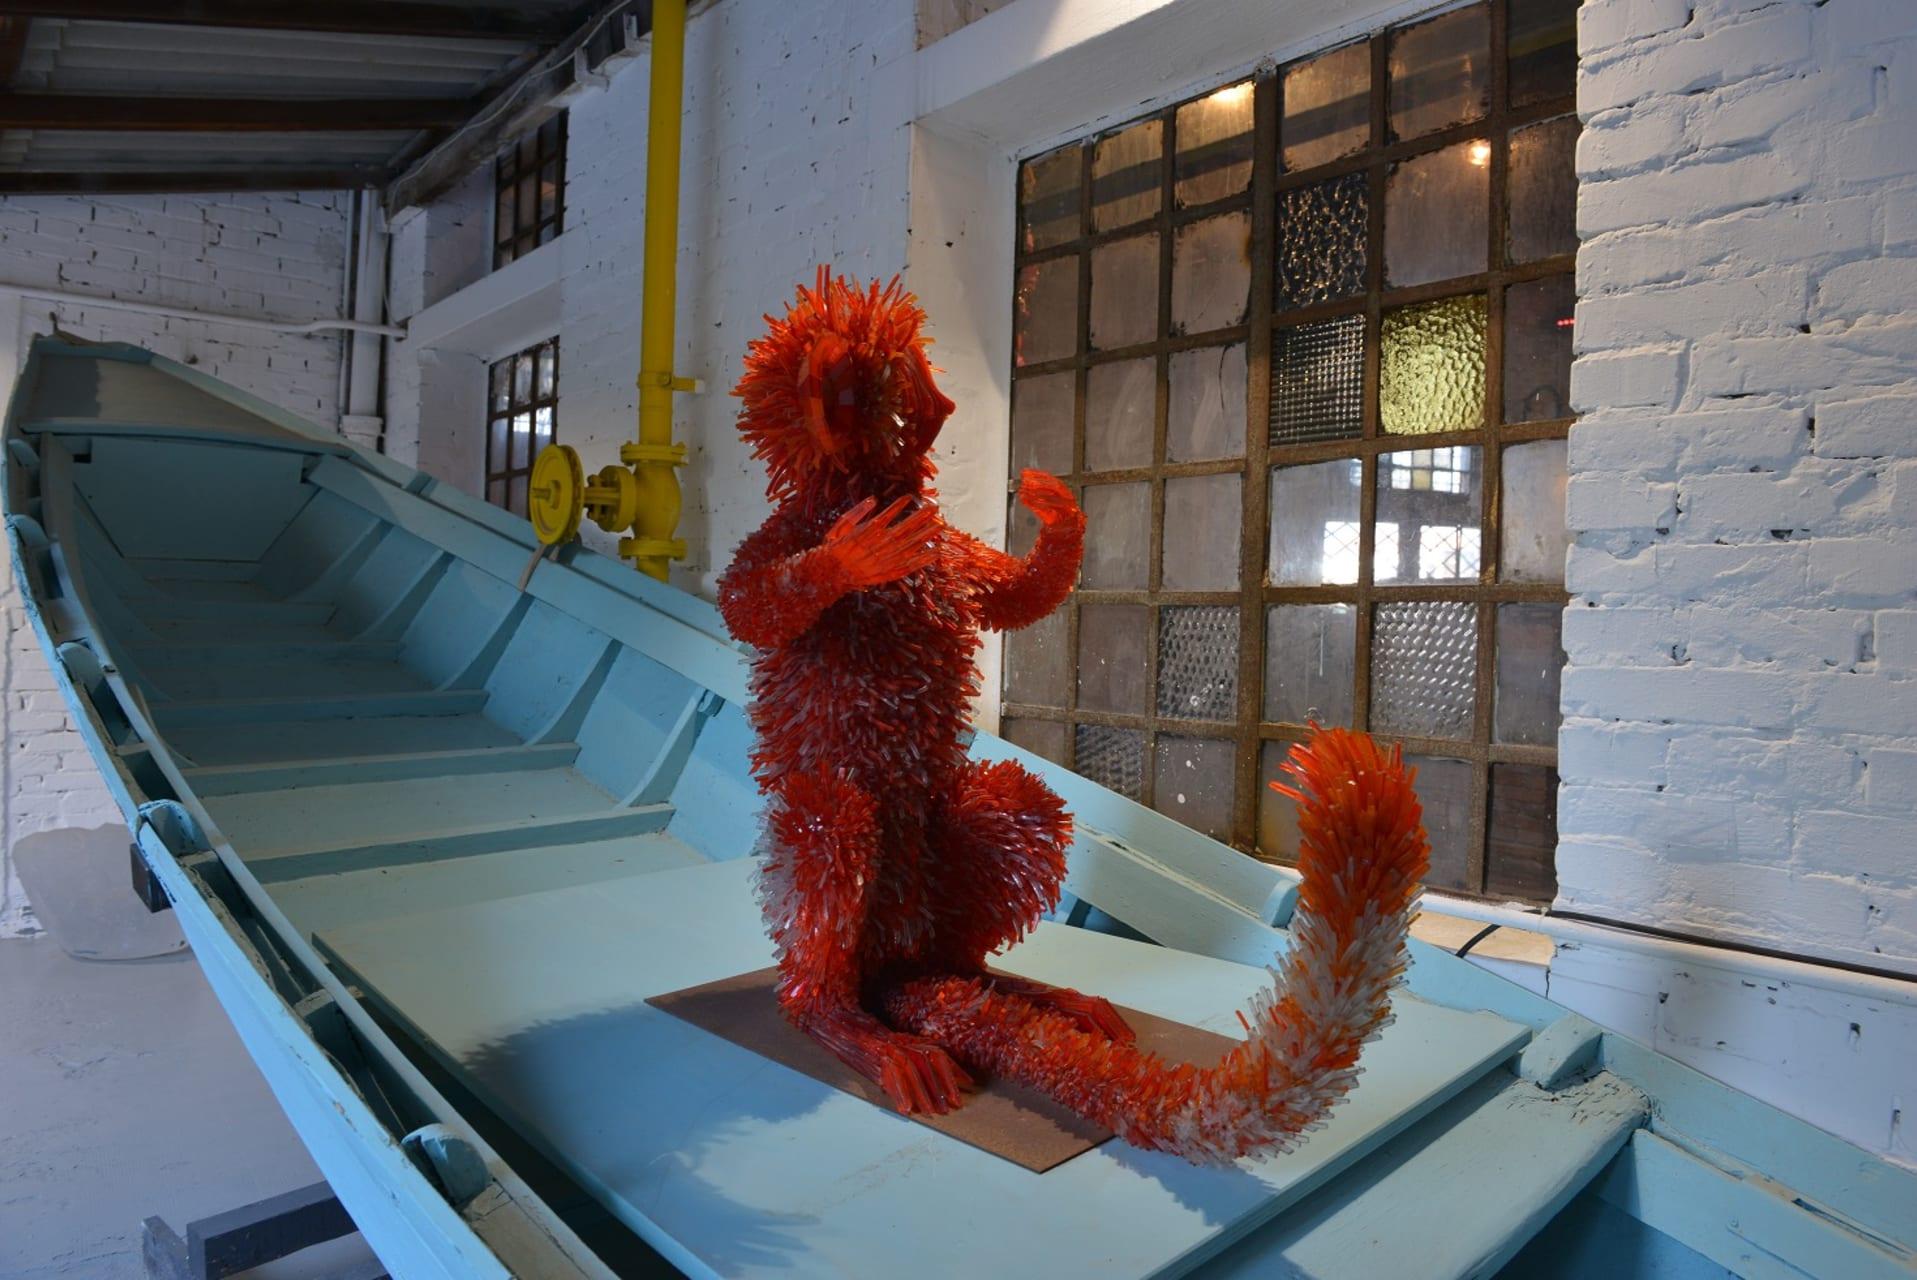 Veneto - Murano - Glasswork gallery visit